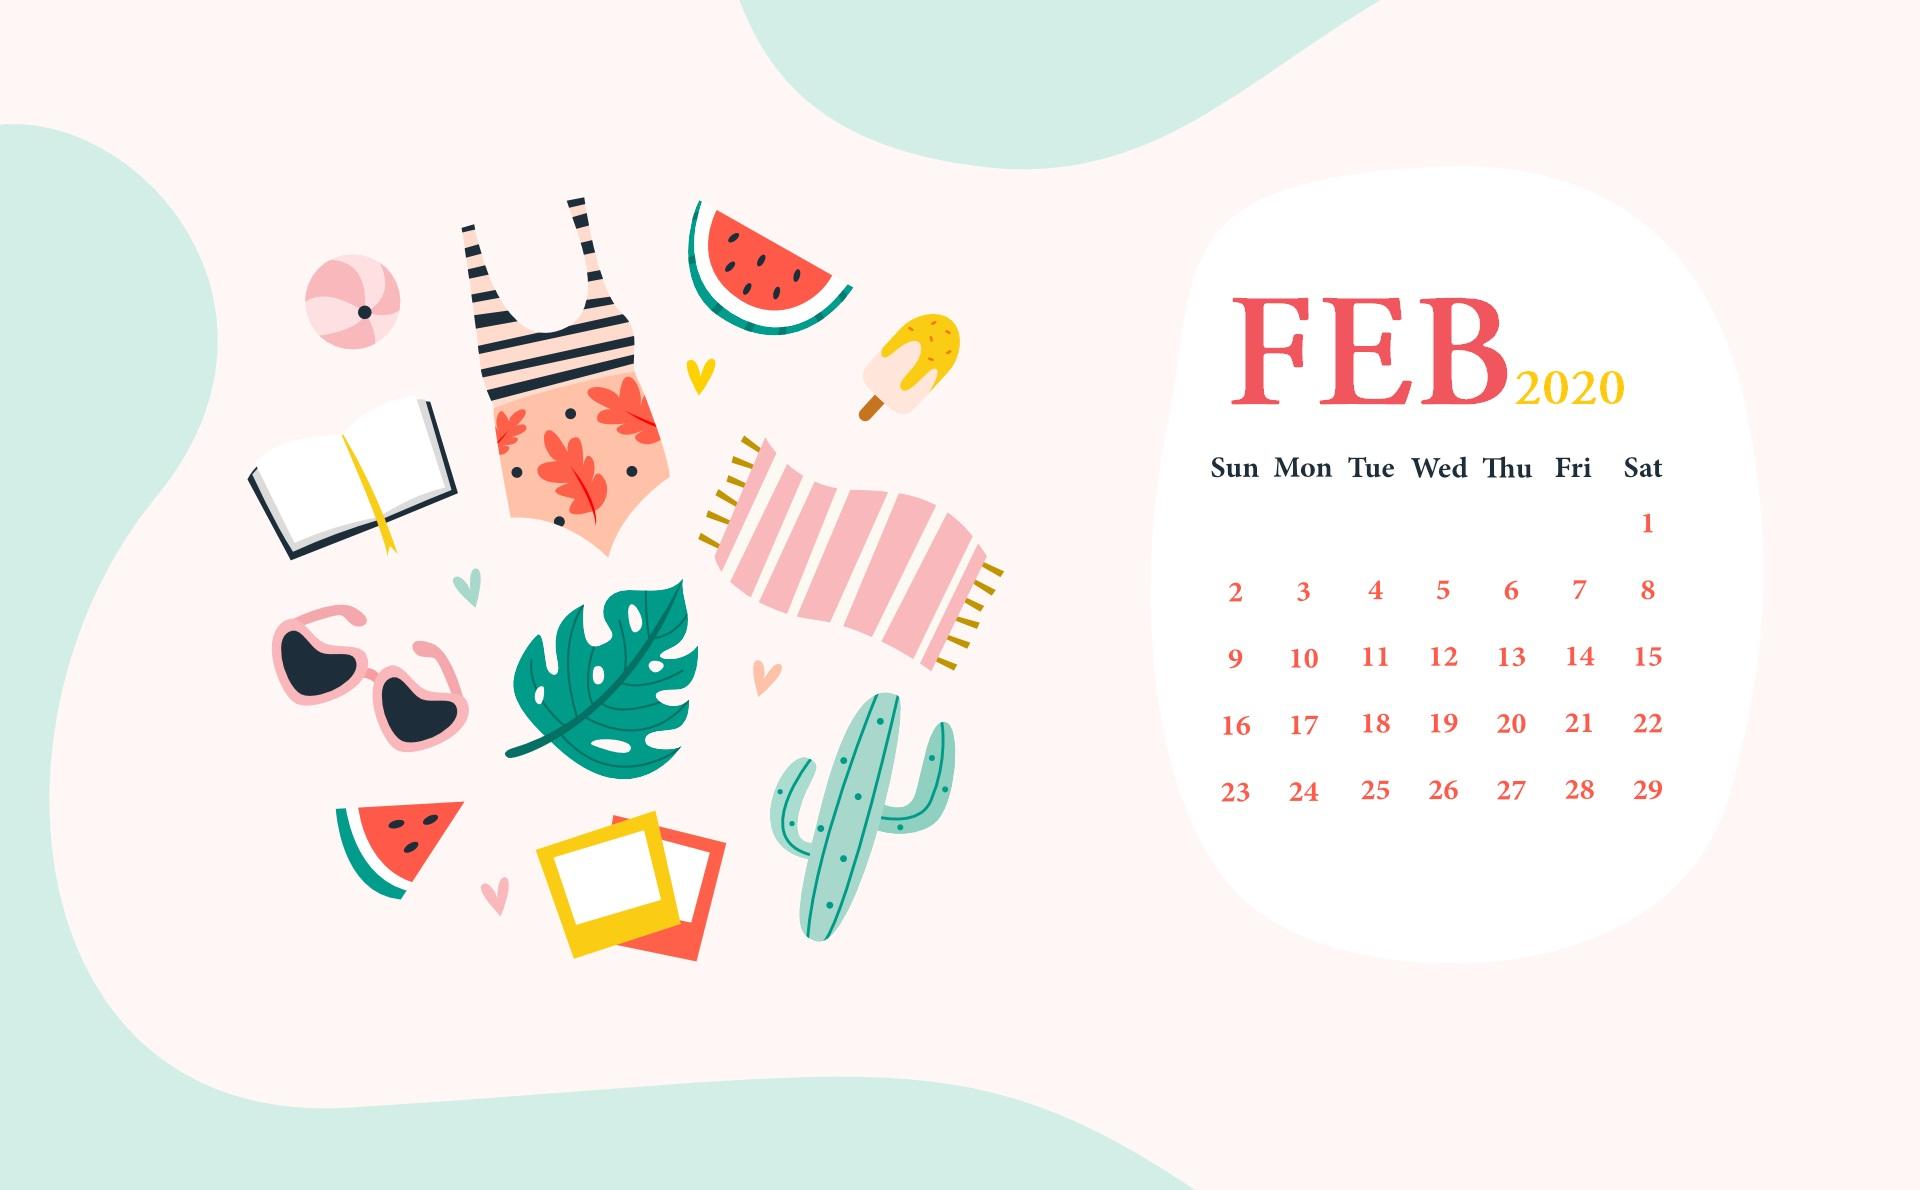 February 2020 Calendar Wallpaper